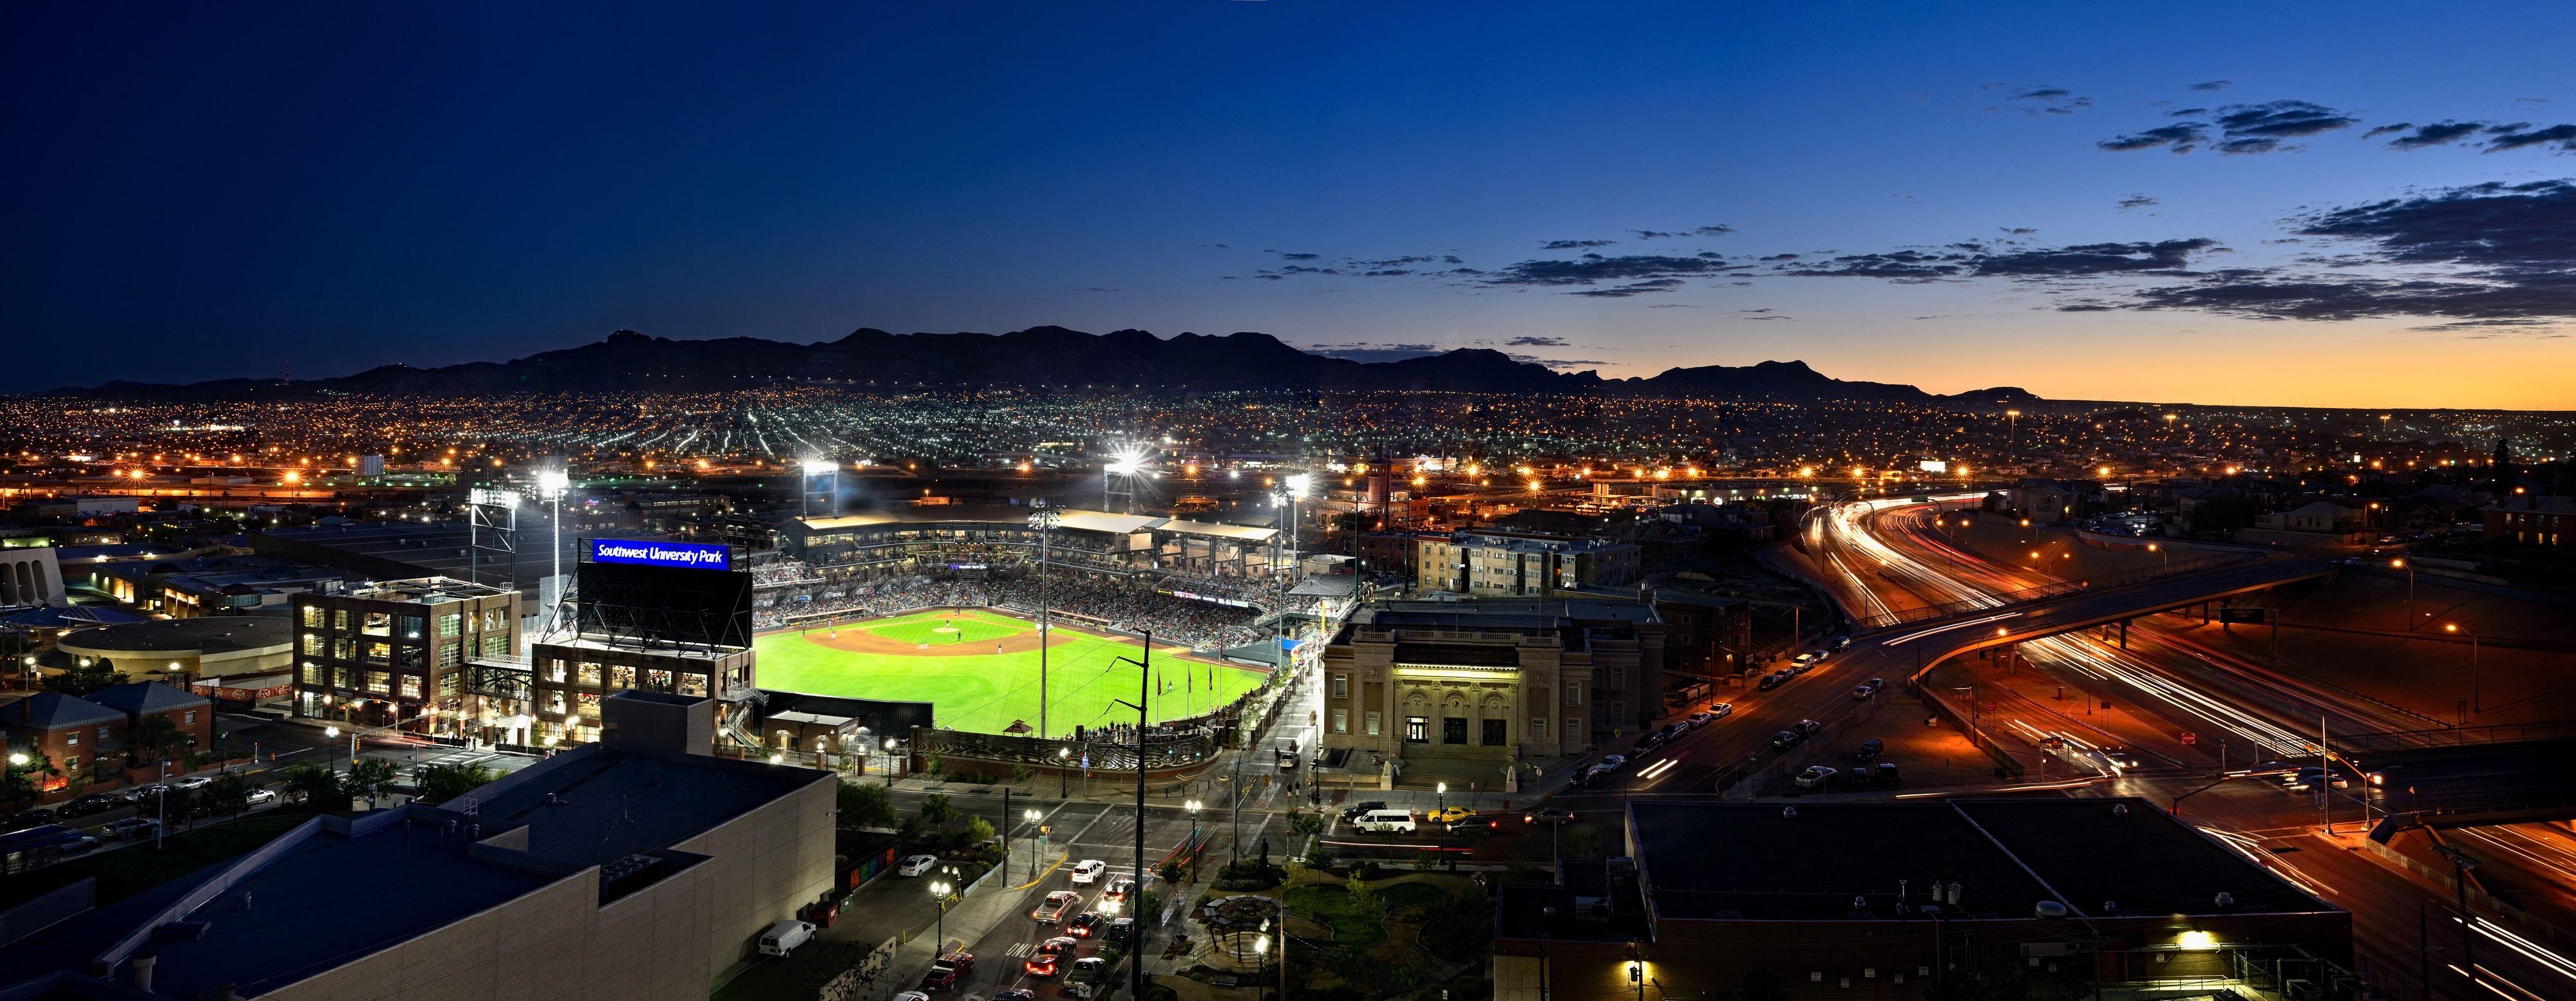 City Spotlight El Paso Texas travel